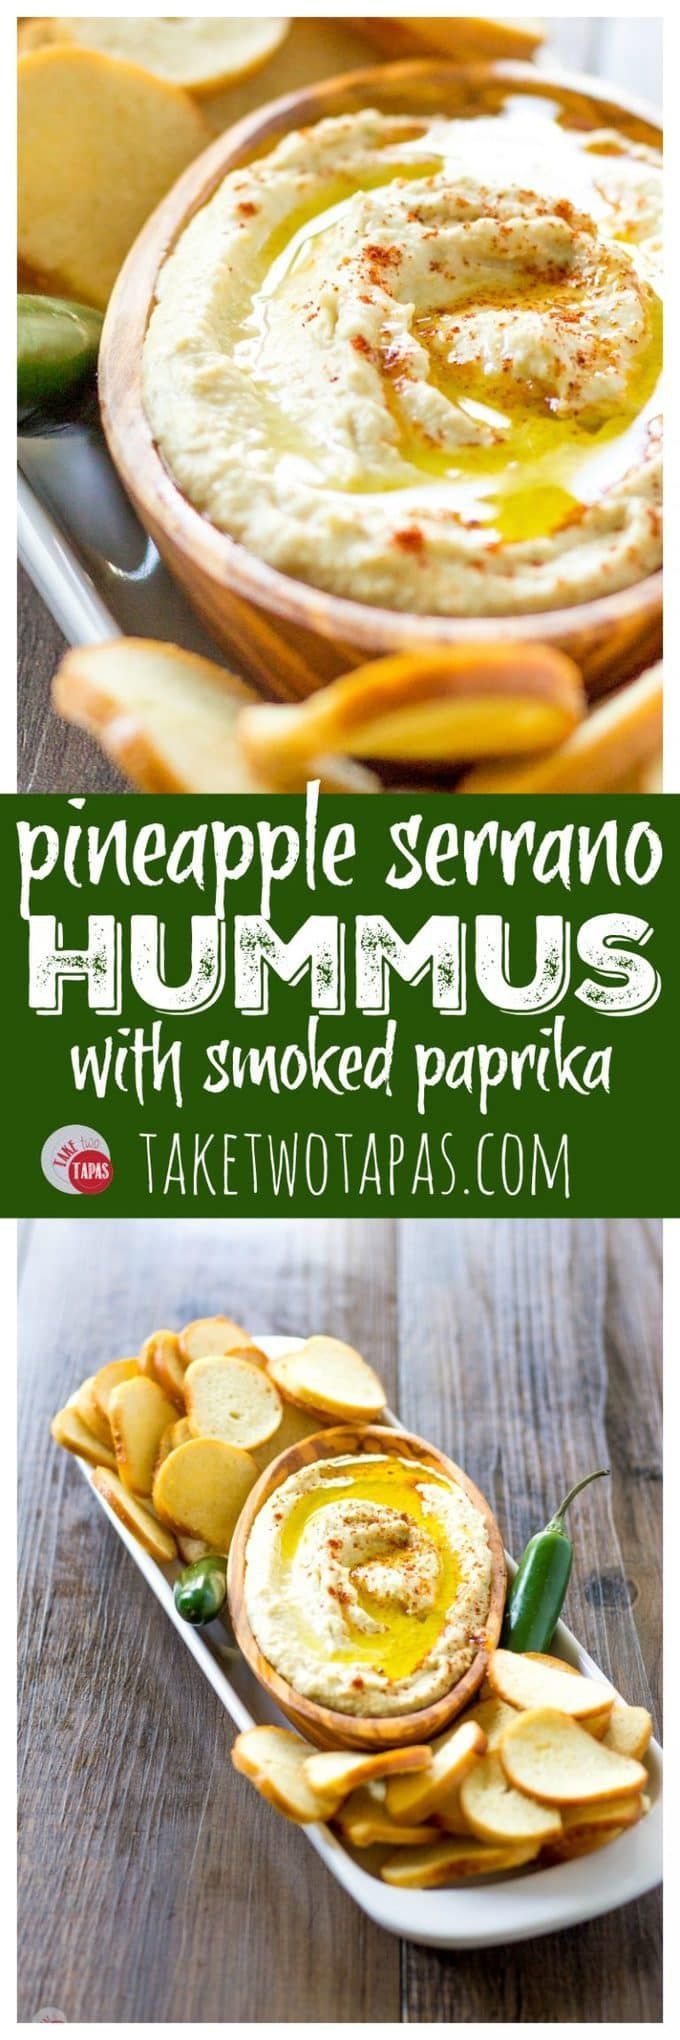 Hummus with Pineapple and Smoked Paprika | Take Two Tapas